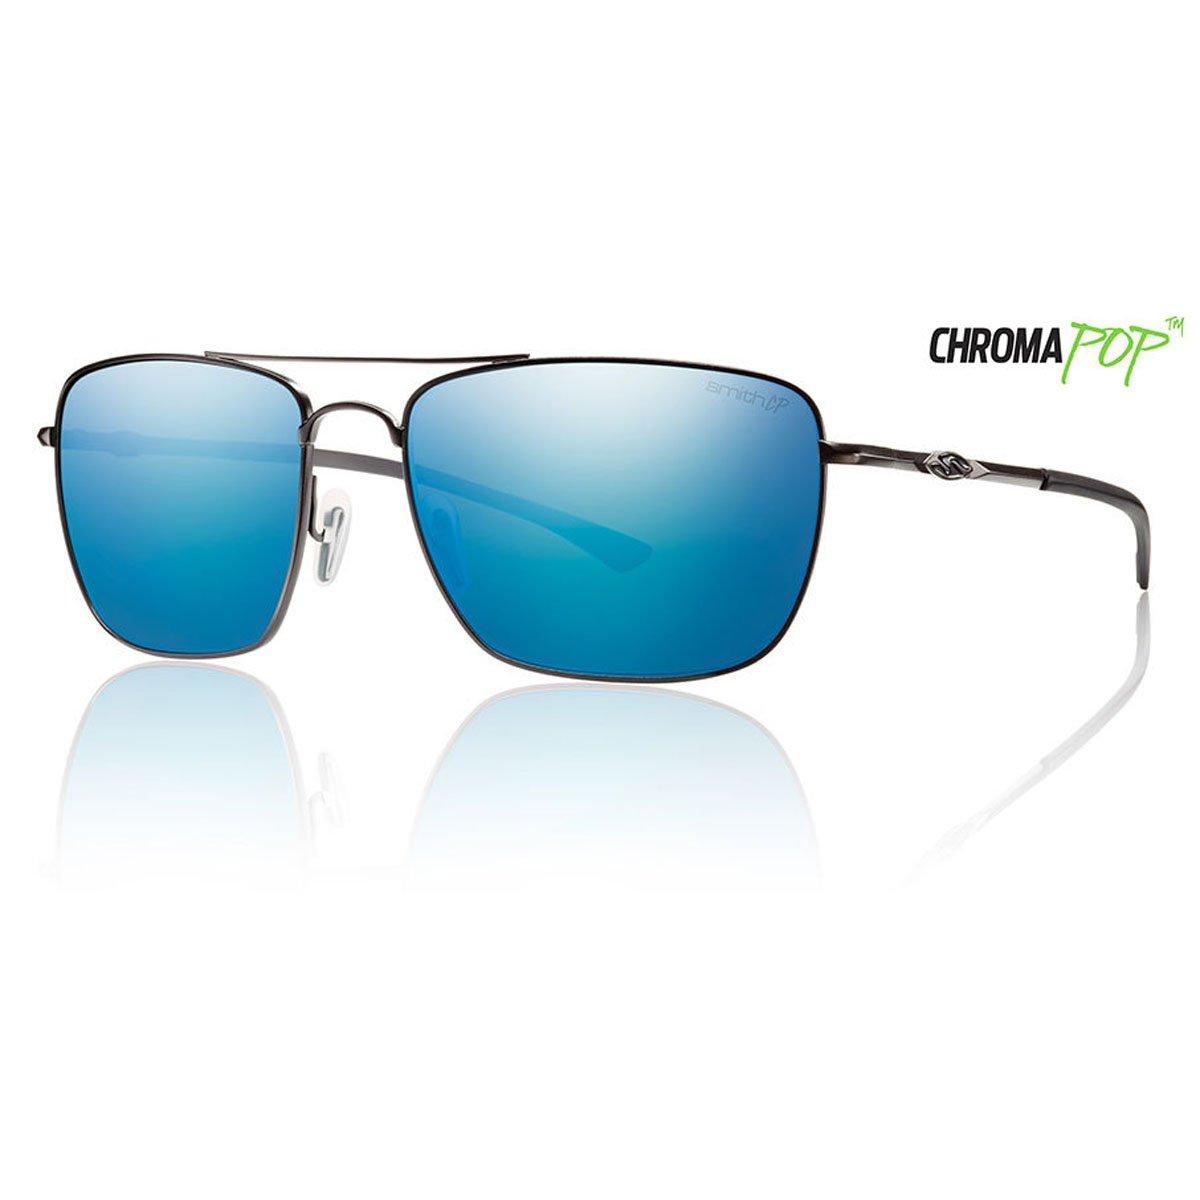 71dd3acecc Amazon.com  Smith Optics Audible Premium Lifestyle Polarized Sunglasses